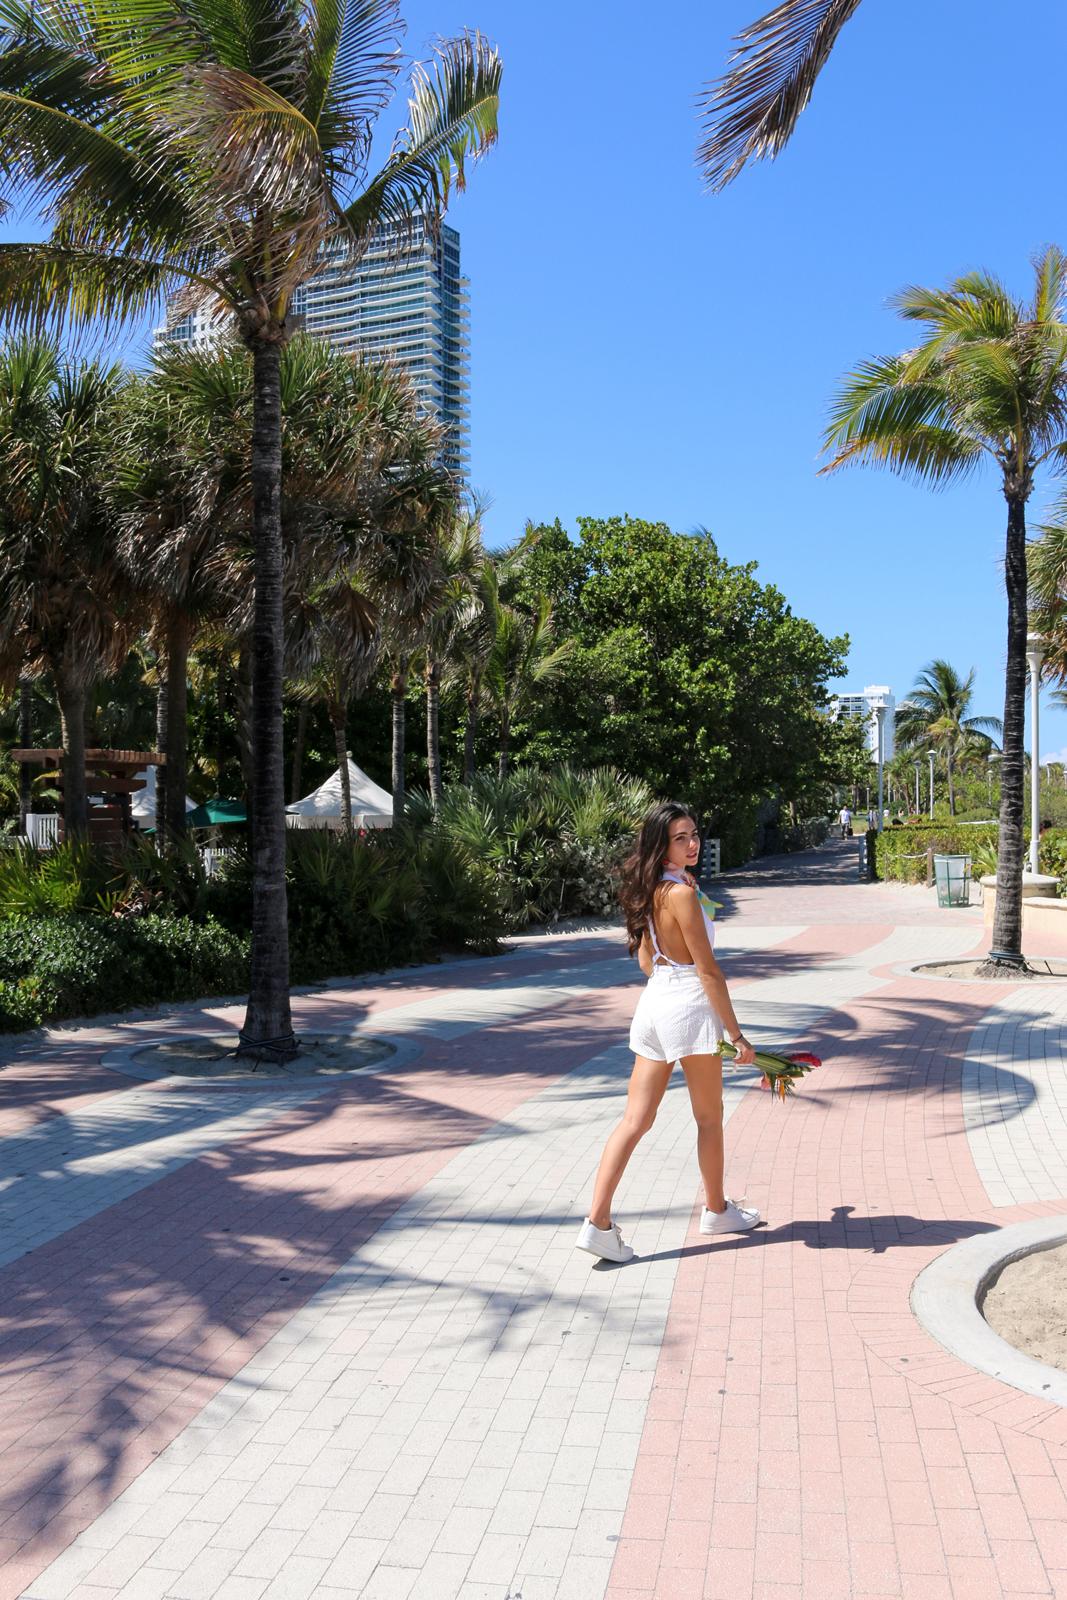 sb miami boardwalk